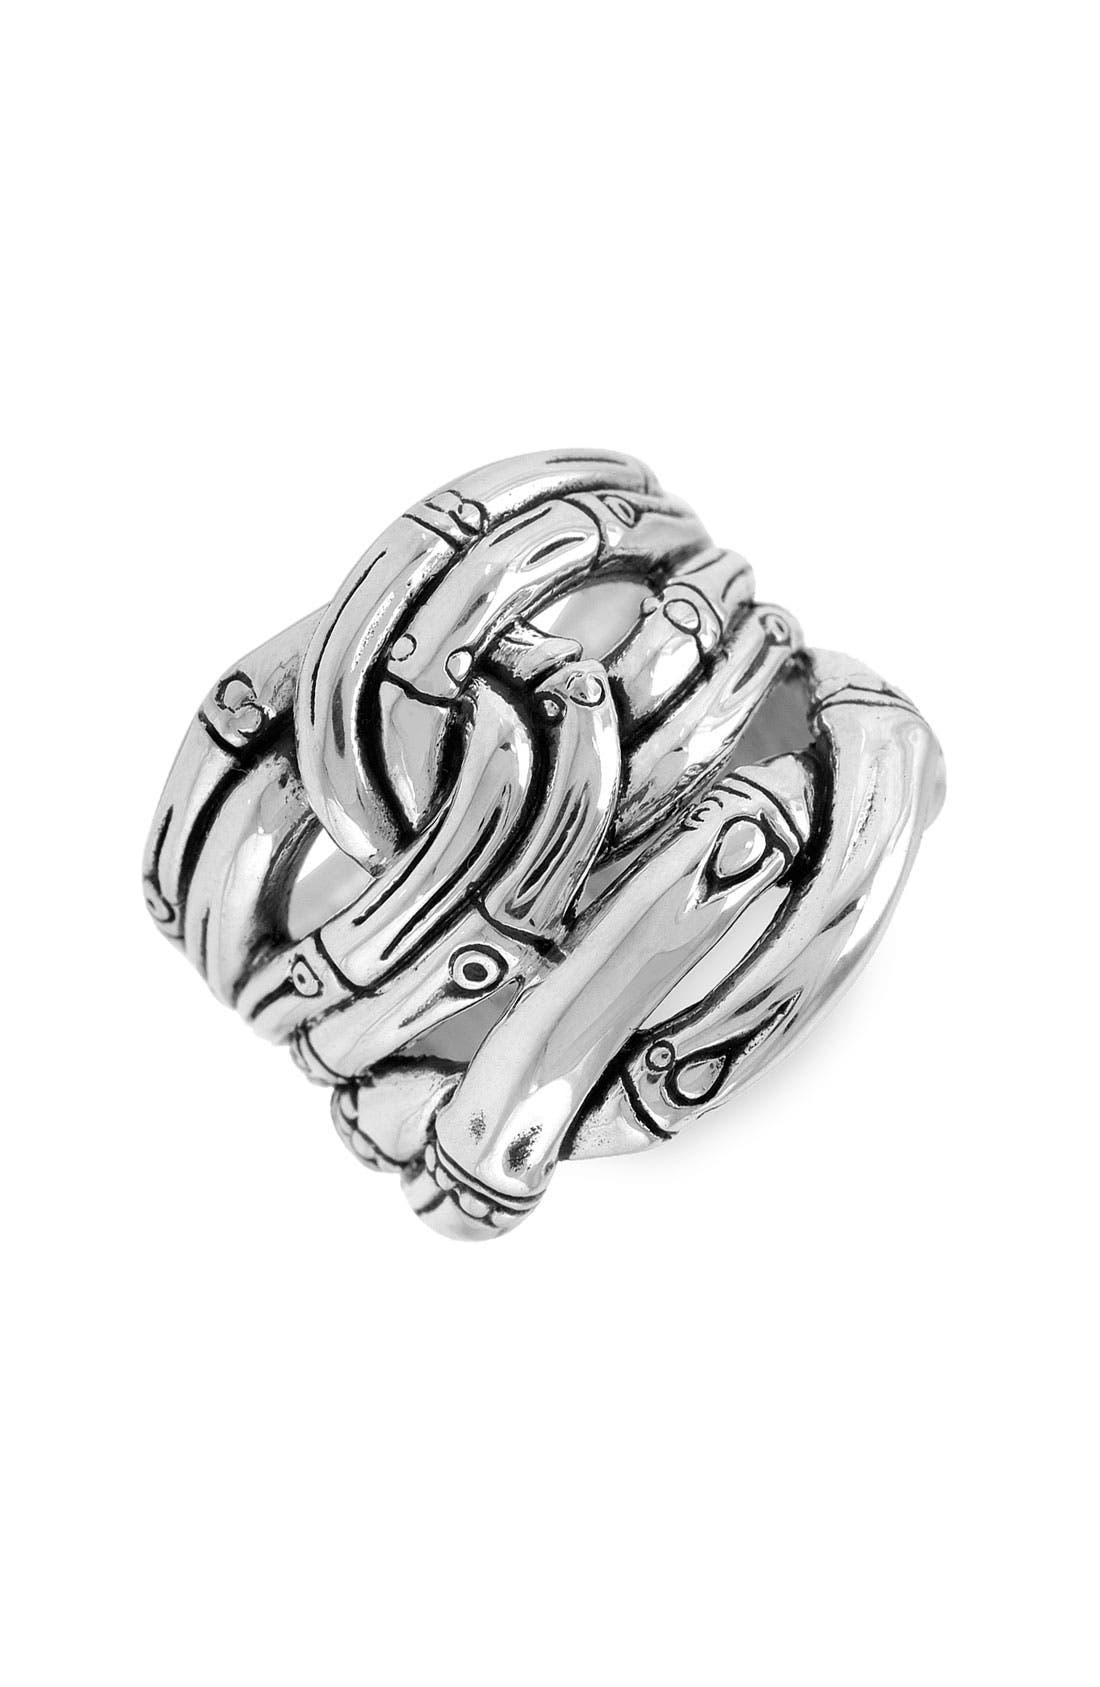 Main Image - John Hardy 'Bamboo' Woven Silver Ring